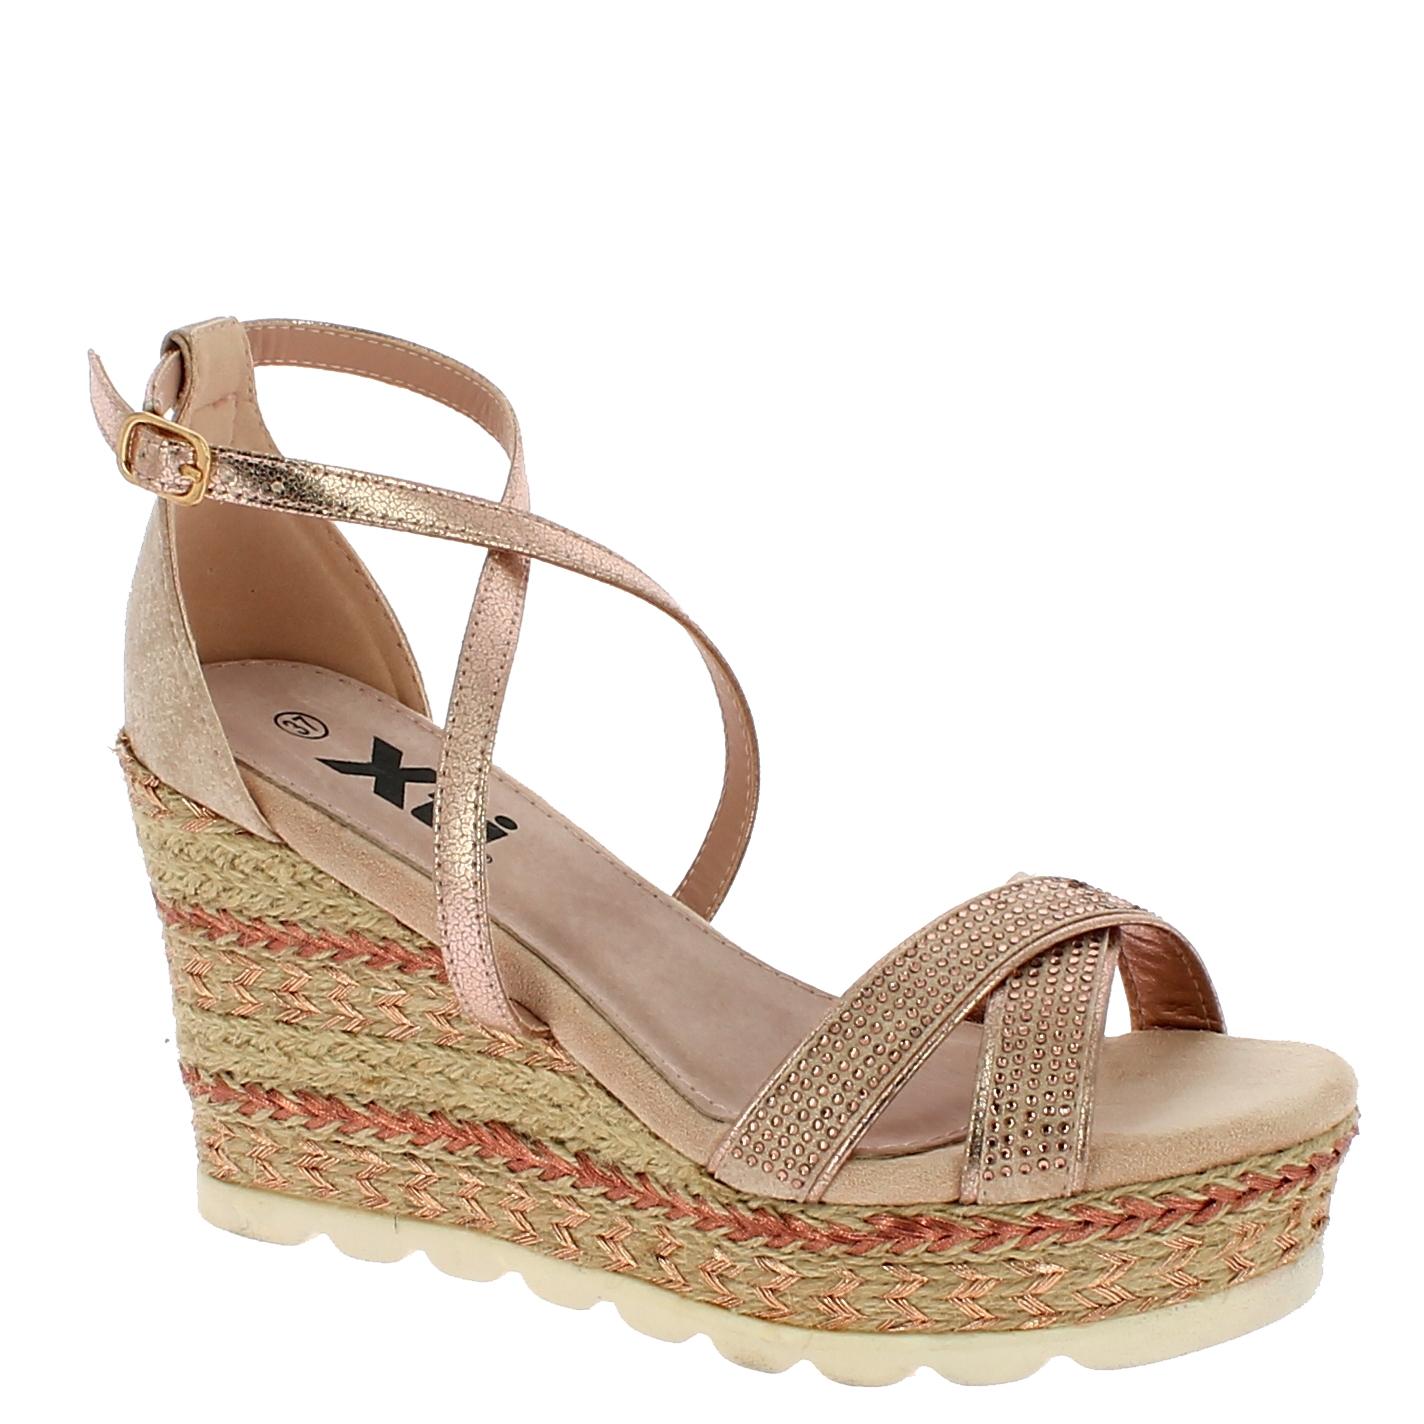 XTI Γυναικεία Πλατφόρμα 49001 Μπρονζέ - XTI - 49001 NUDE-XTI-bronze-40/1/34/8 παπούτσια  new in